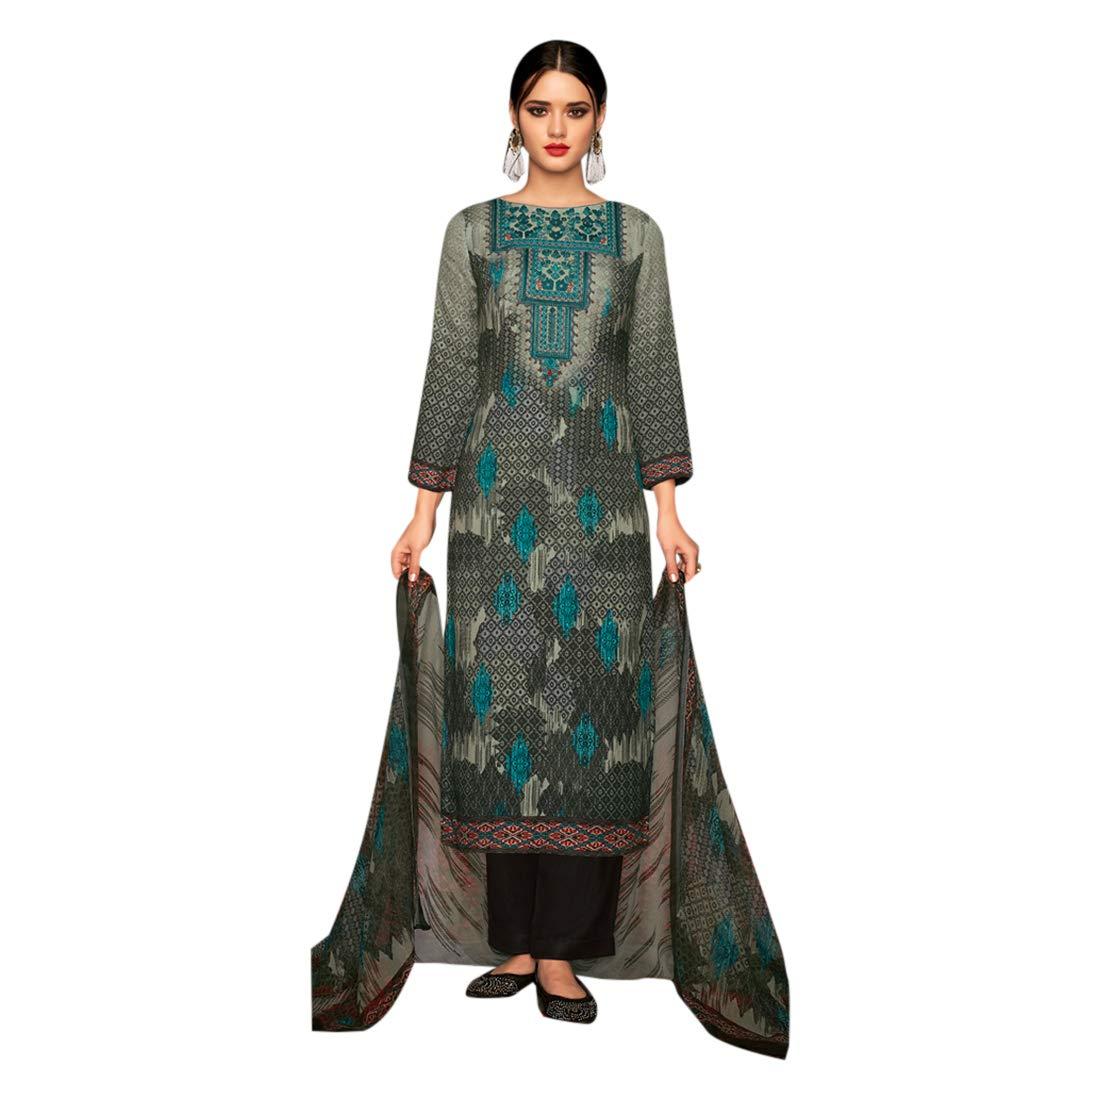 Indian Designer Printed Salwar Kameez suit Ethnic Pant Style Party Formal Wear Muslim 7187